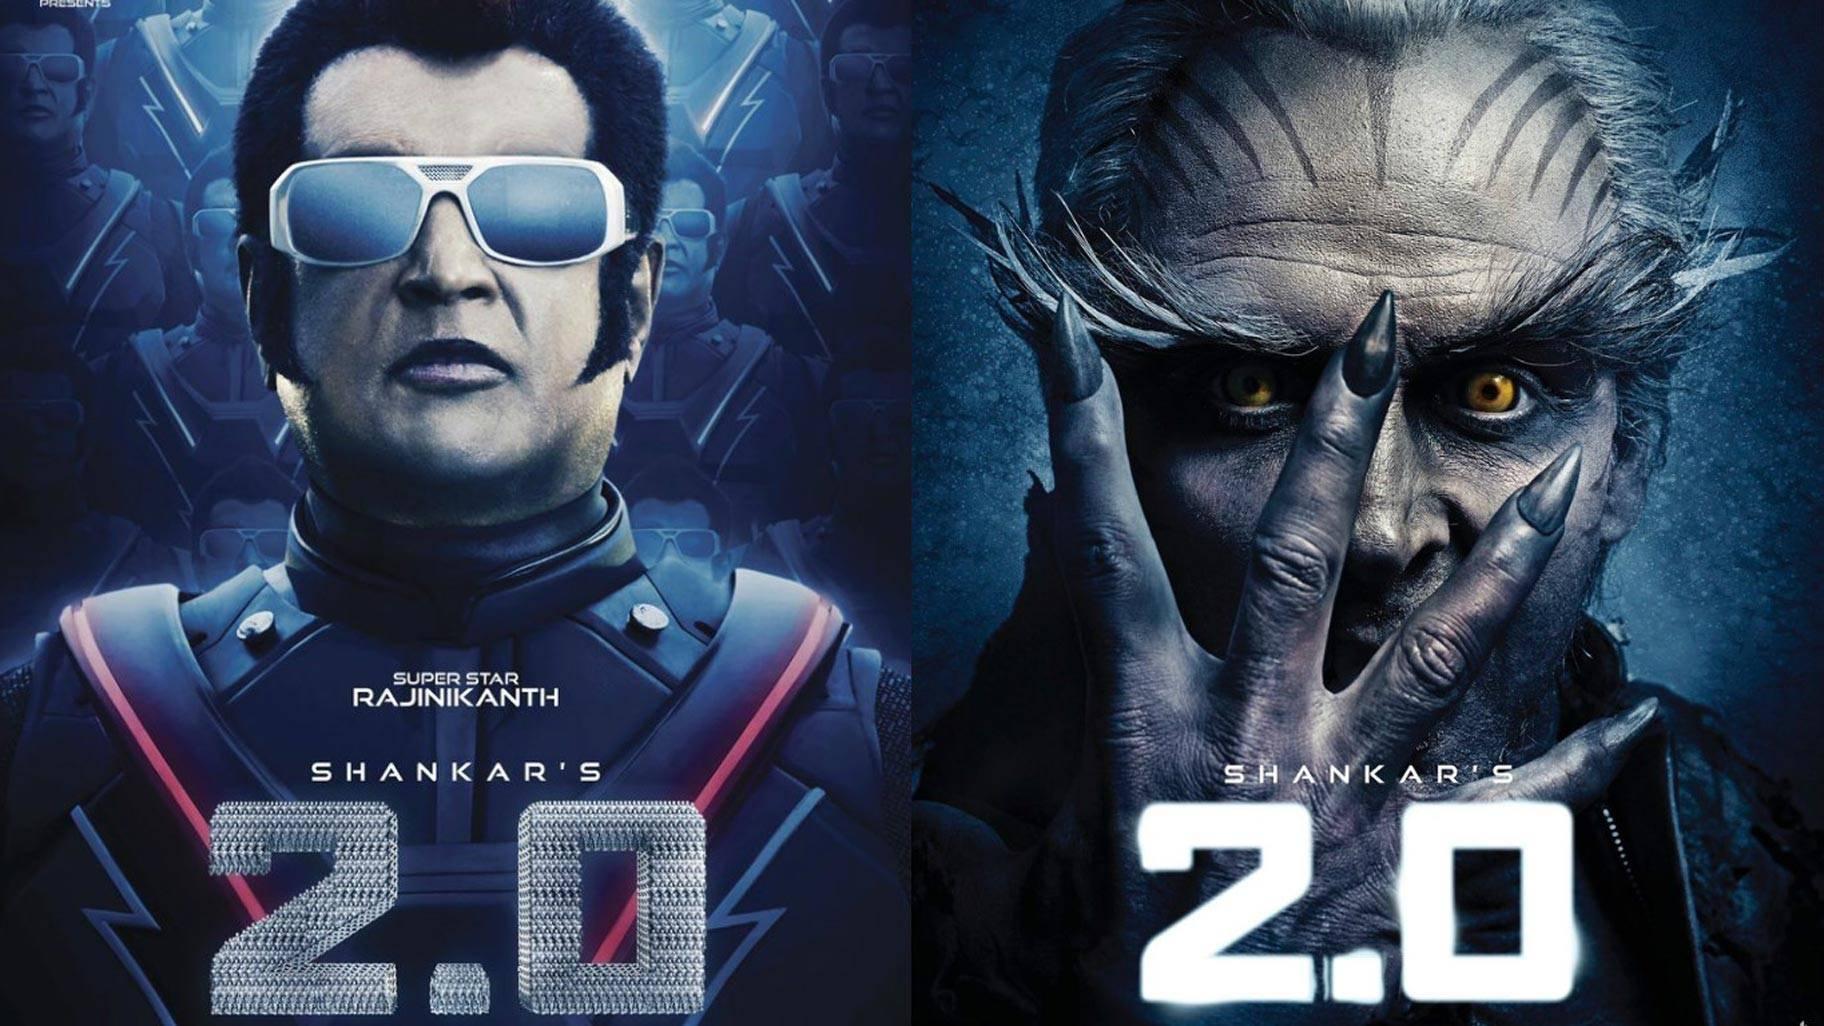 Stills from Akshay Kumar and Rajinikanth starrer 2.0 have been leaked